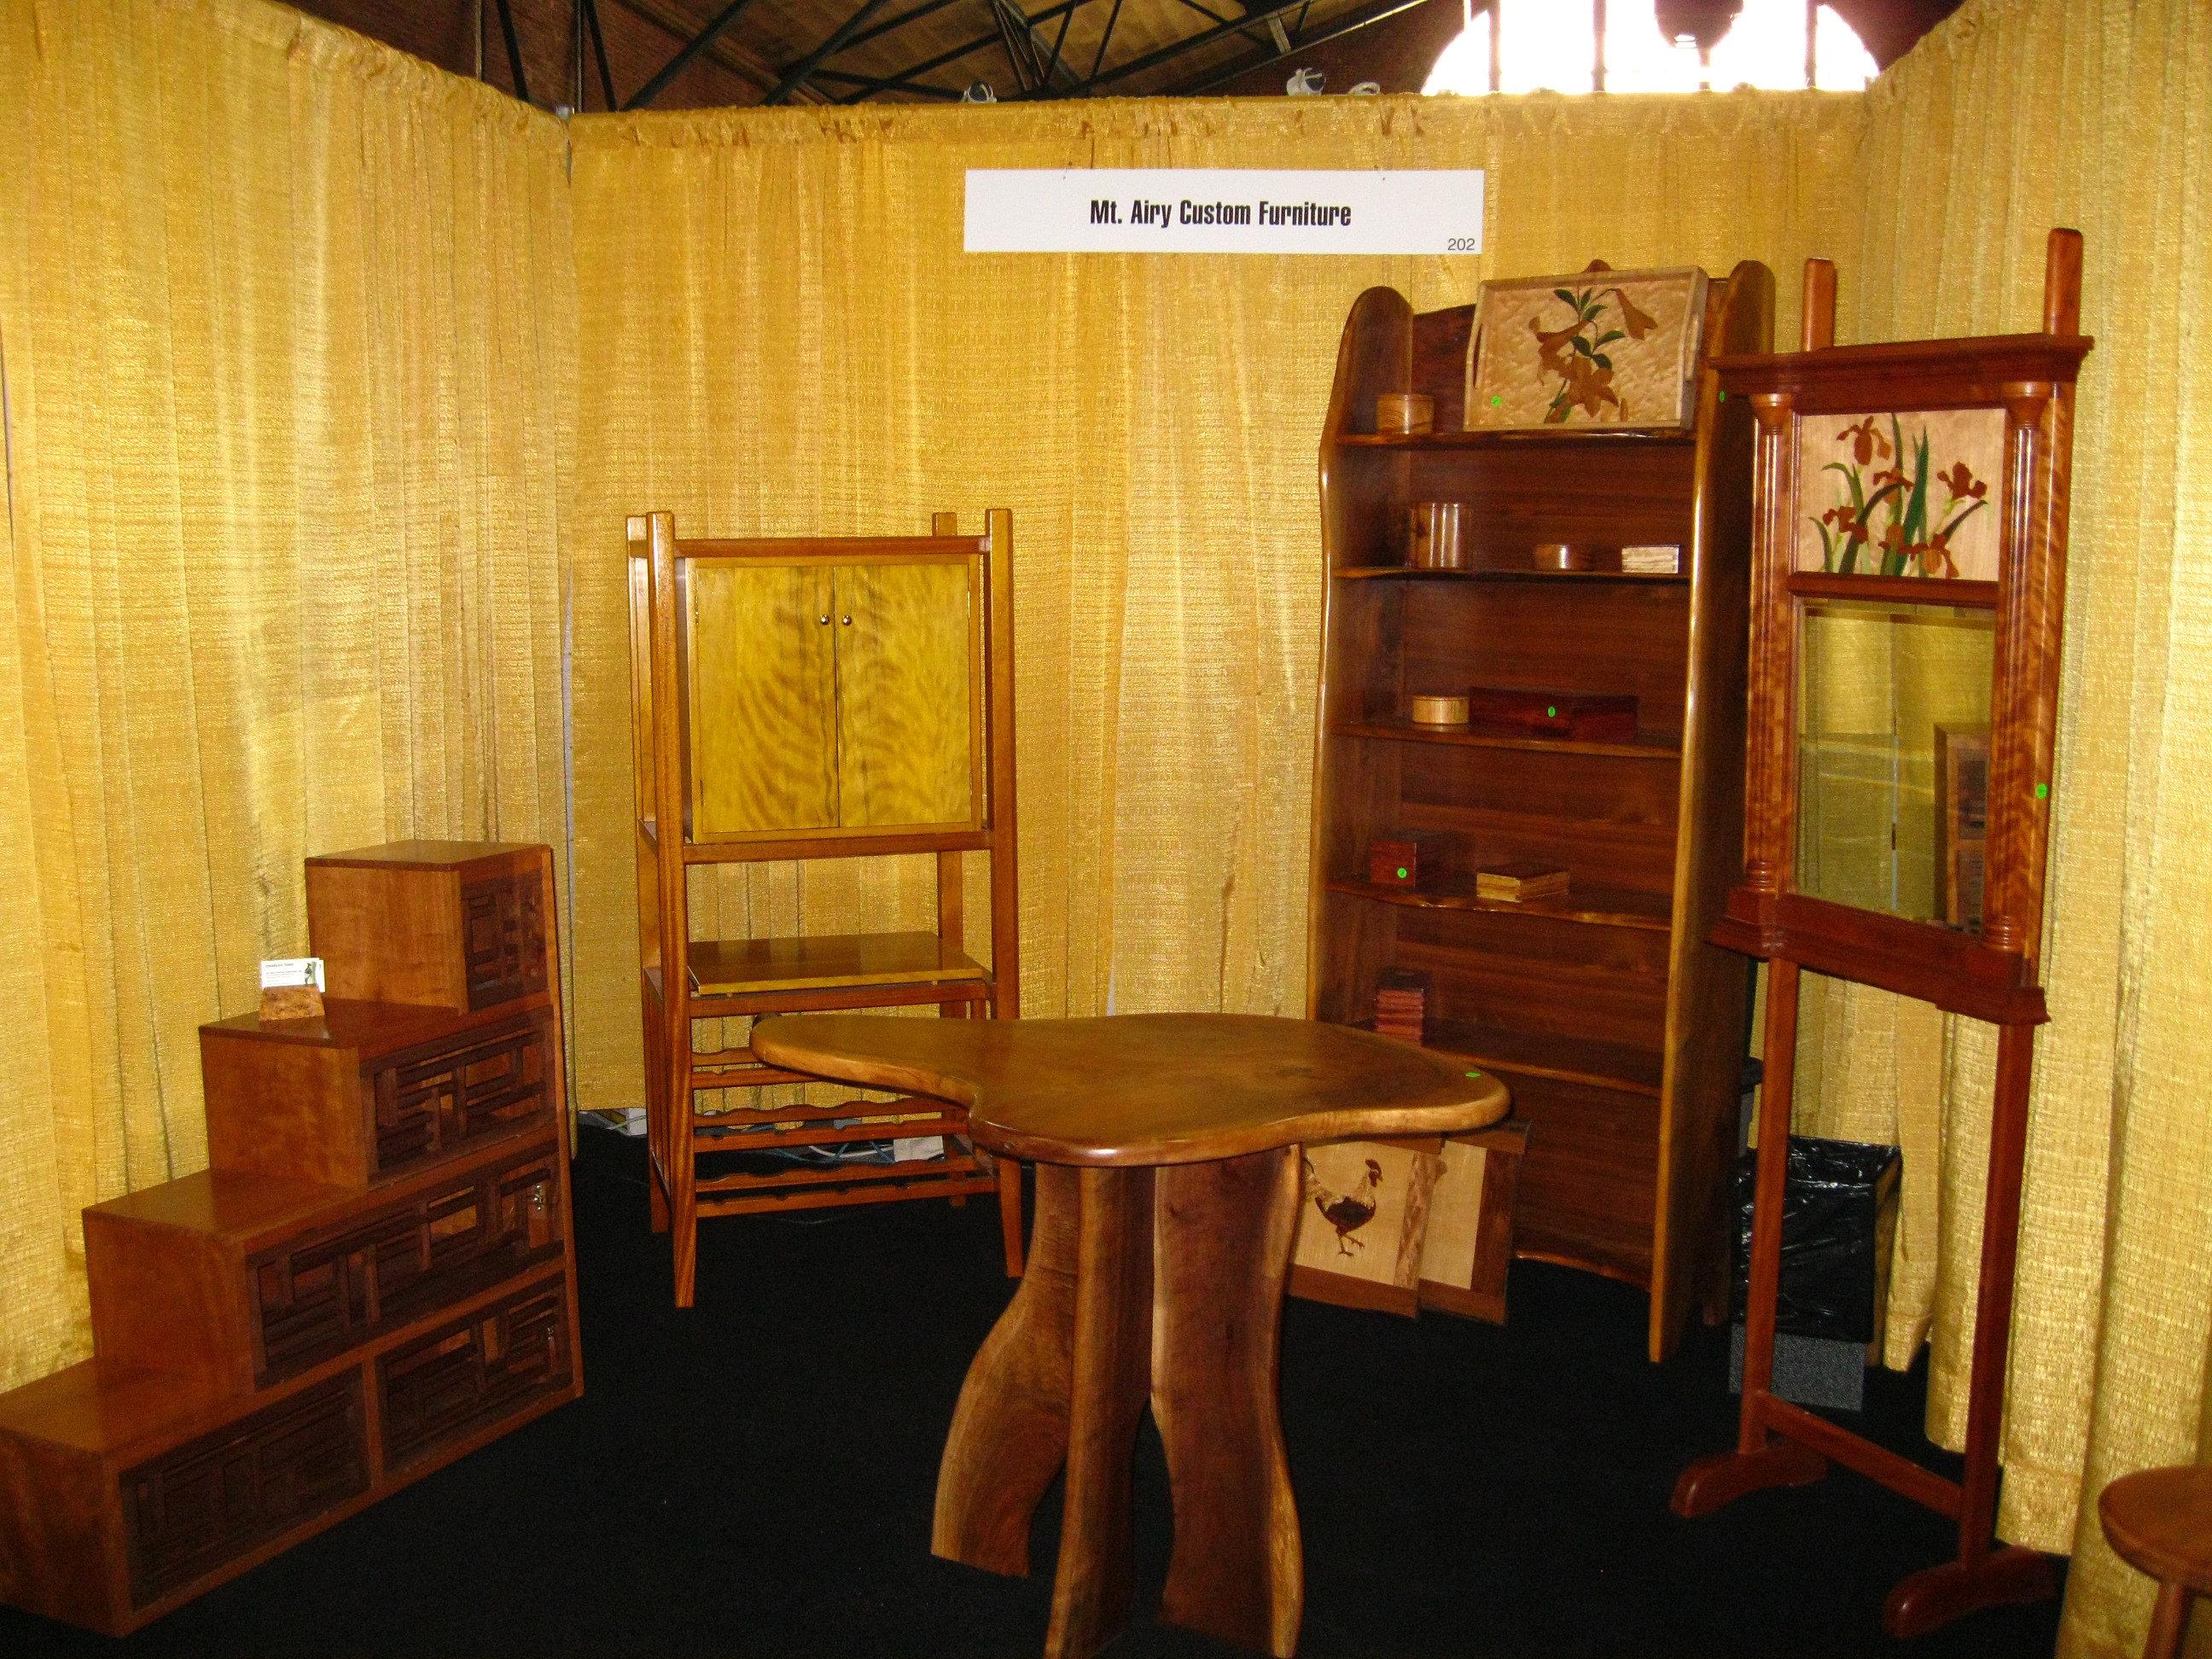 Philadelphia Furniture Show Img 0677 Jpg